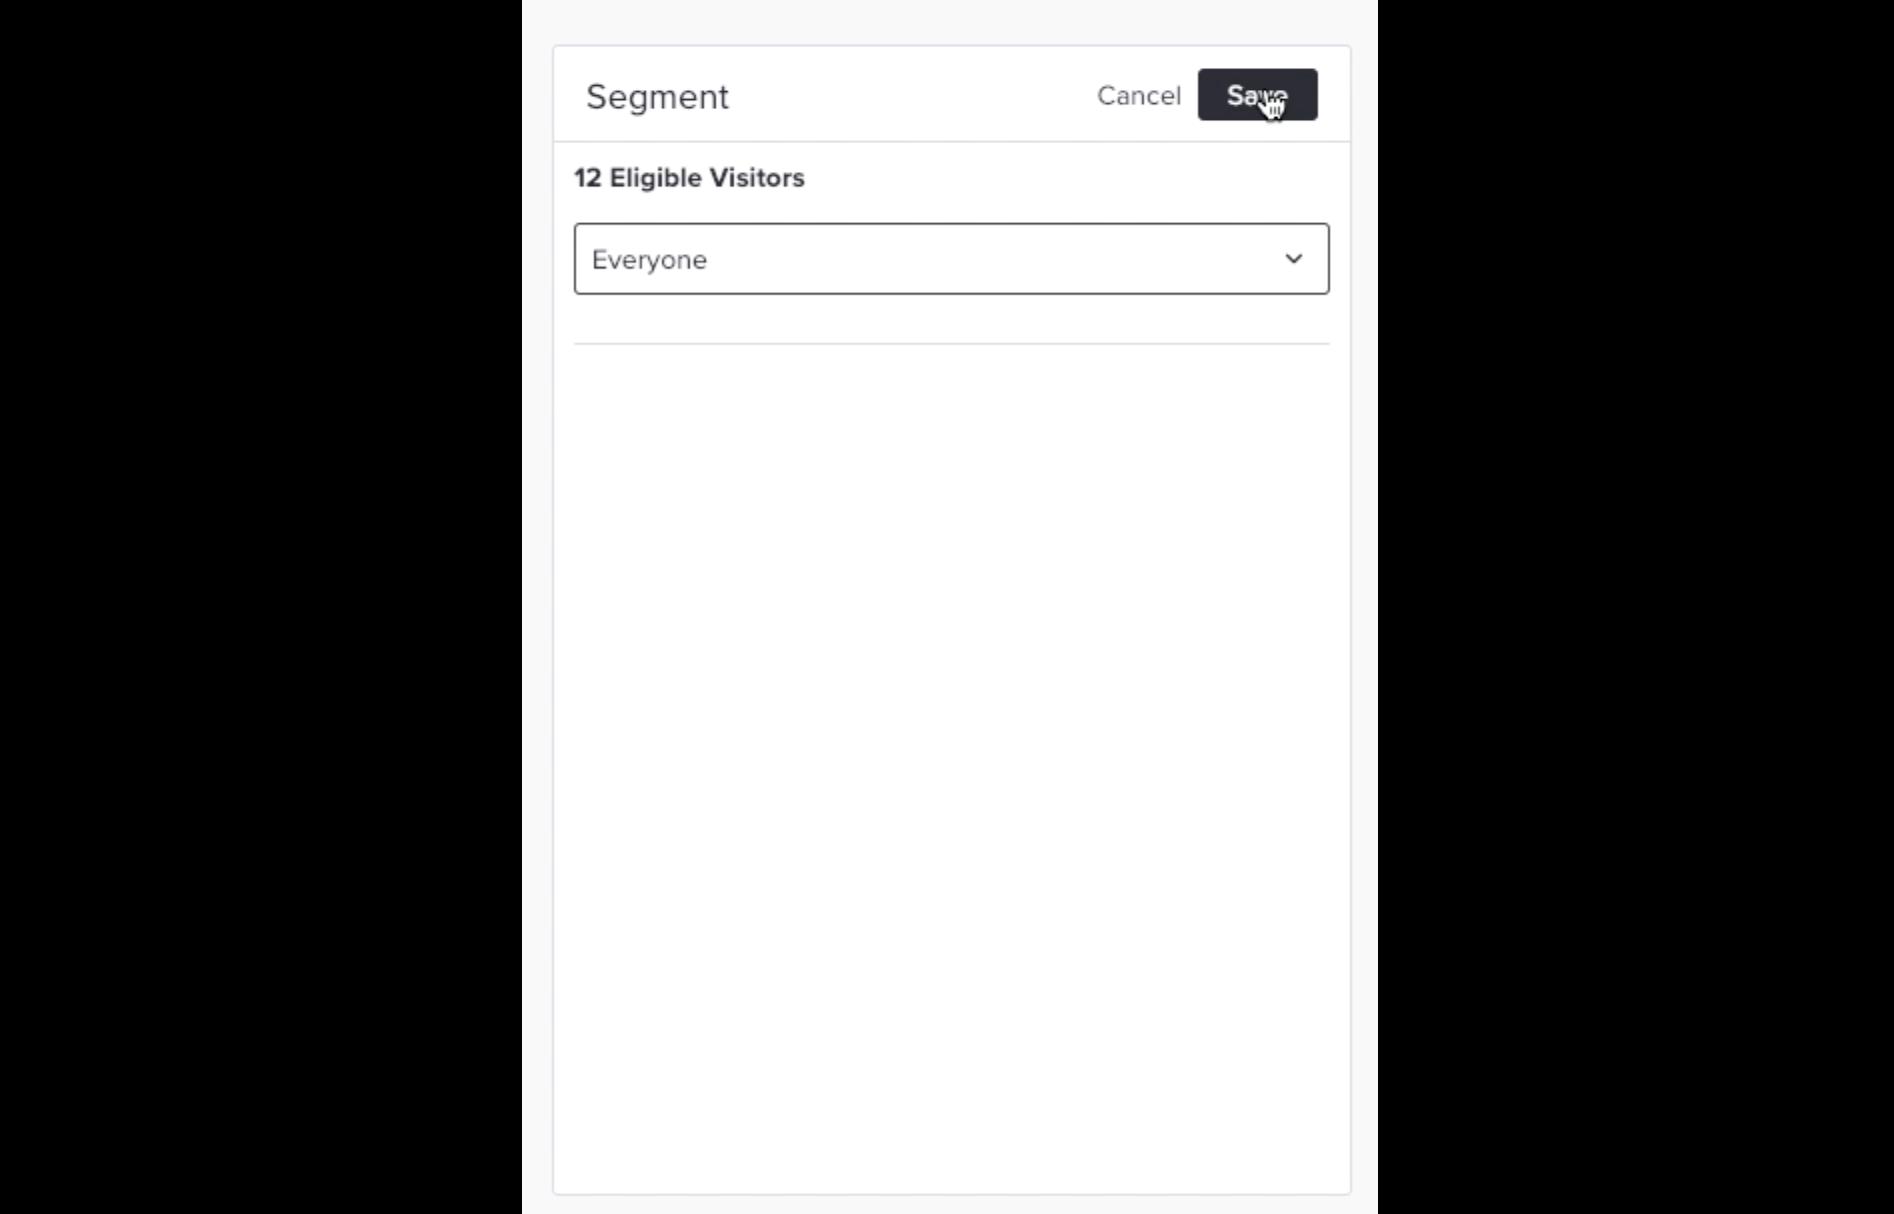 edit-segment.png